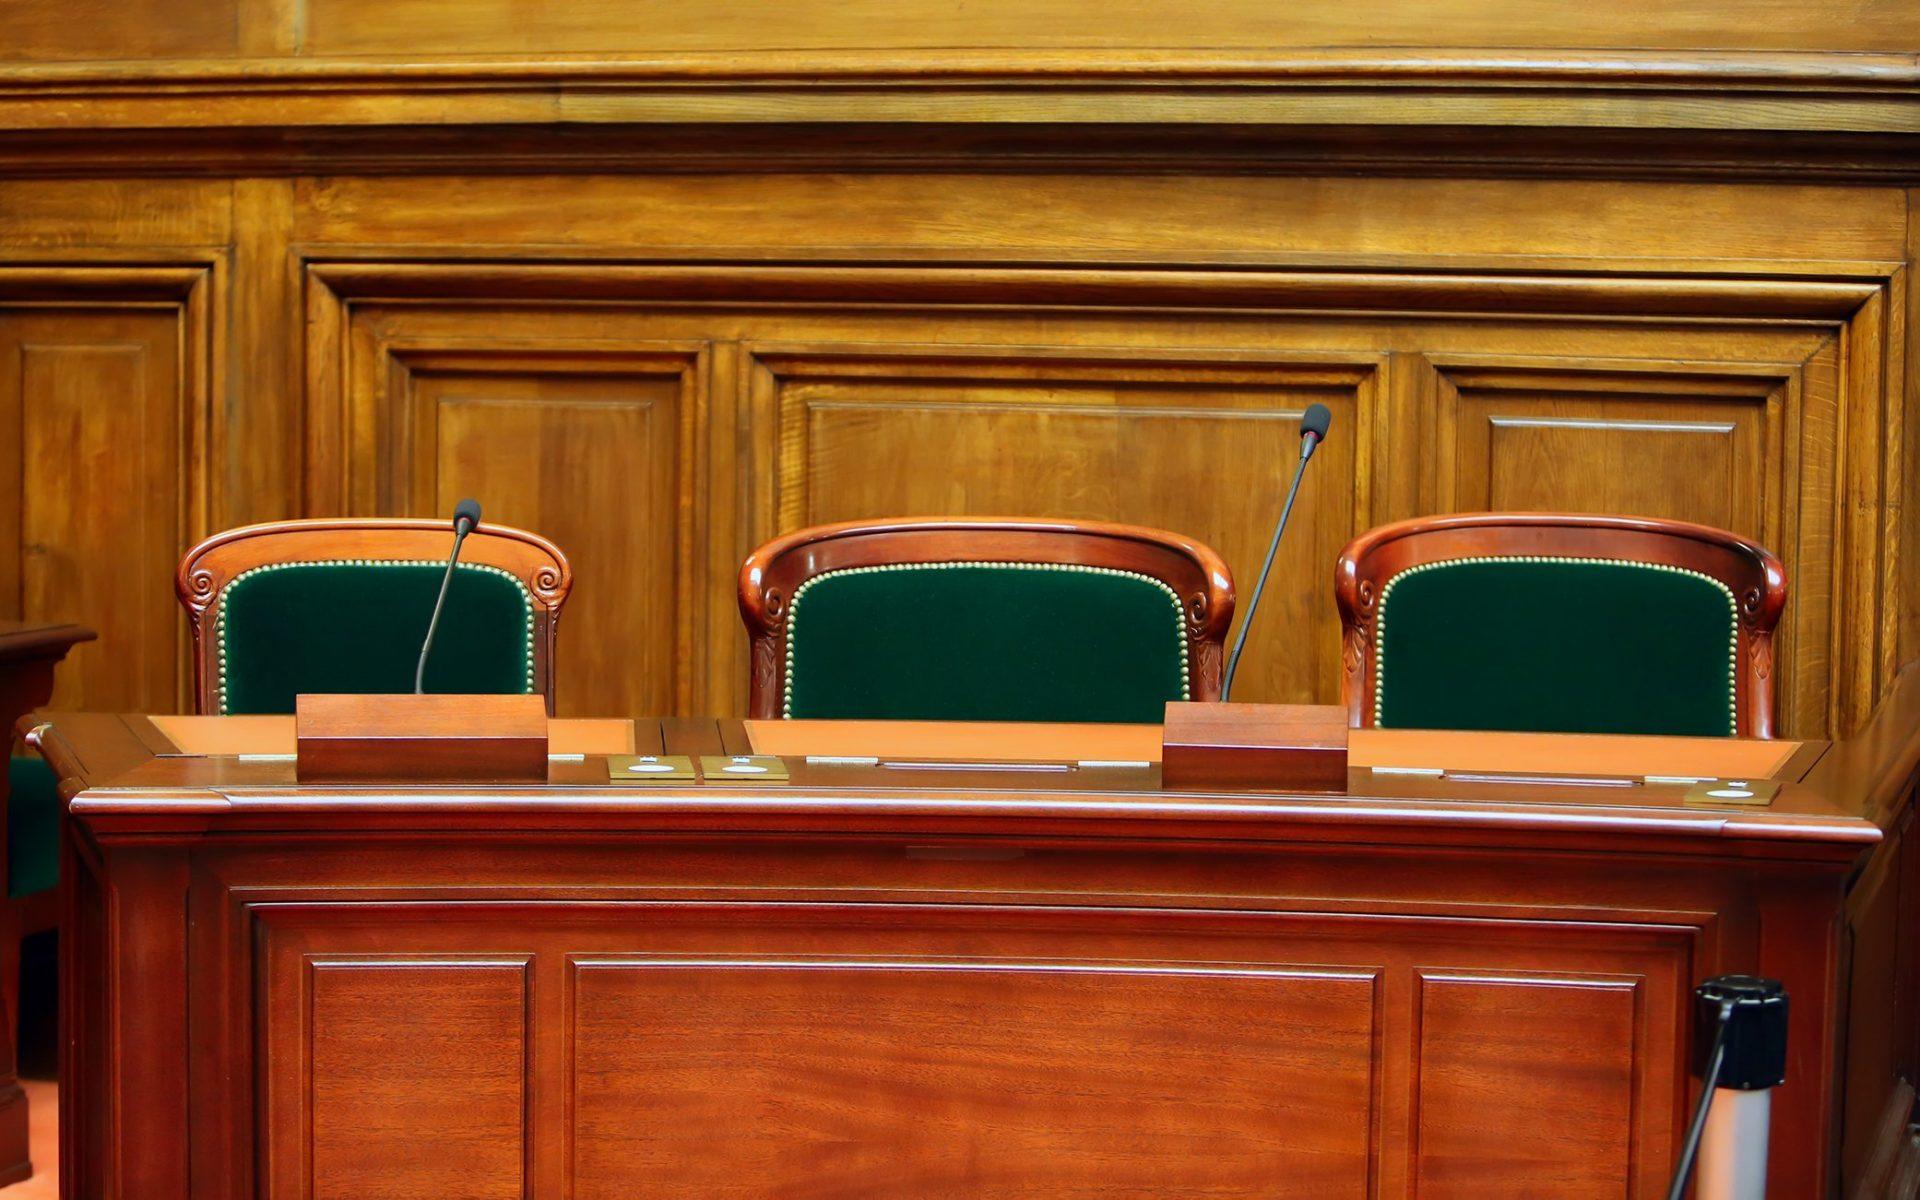 Review of a Visa Refusal at the Tribunal